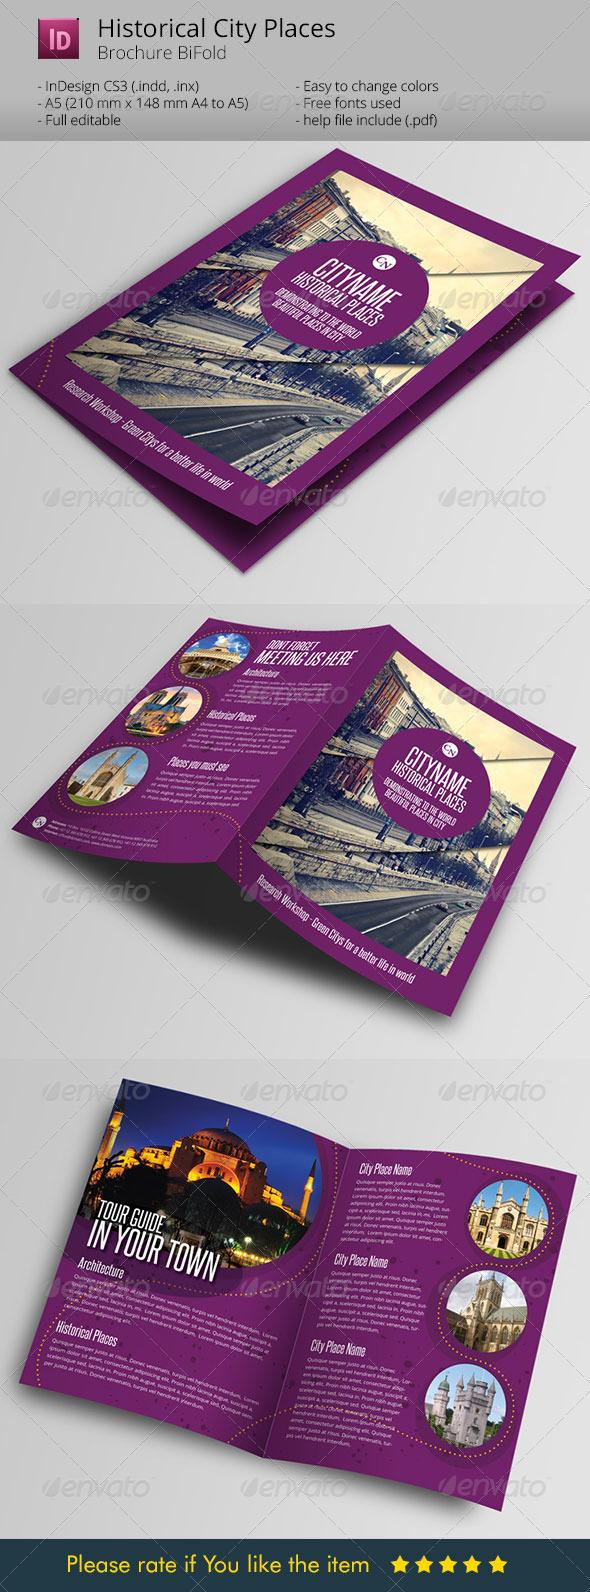 History City Guide Template Brochure - Informational Brochures